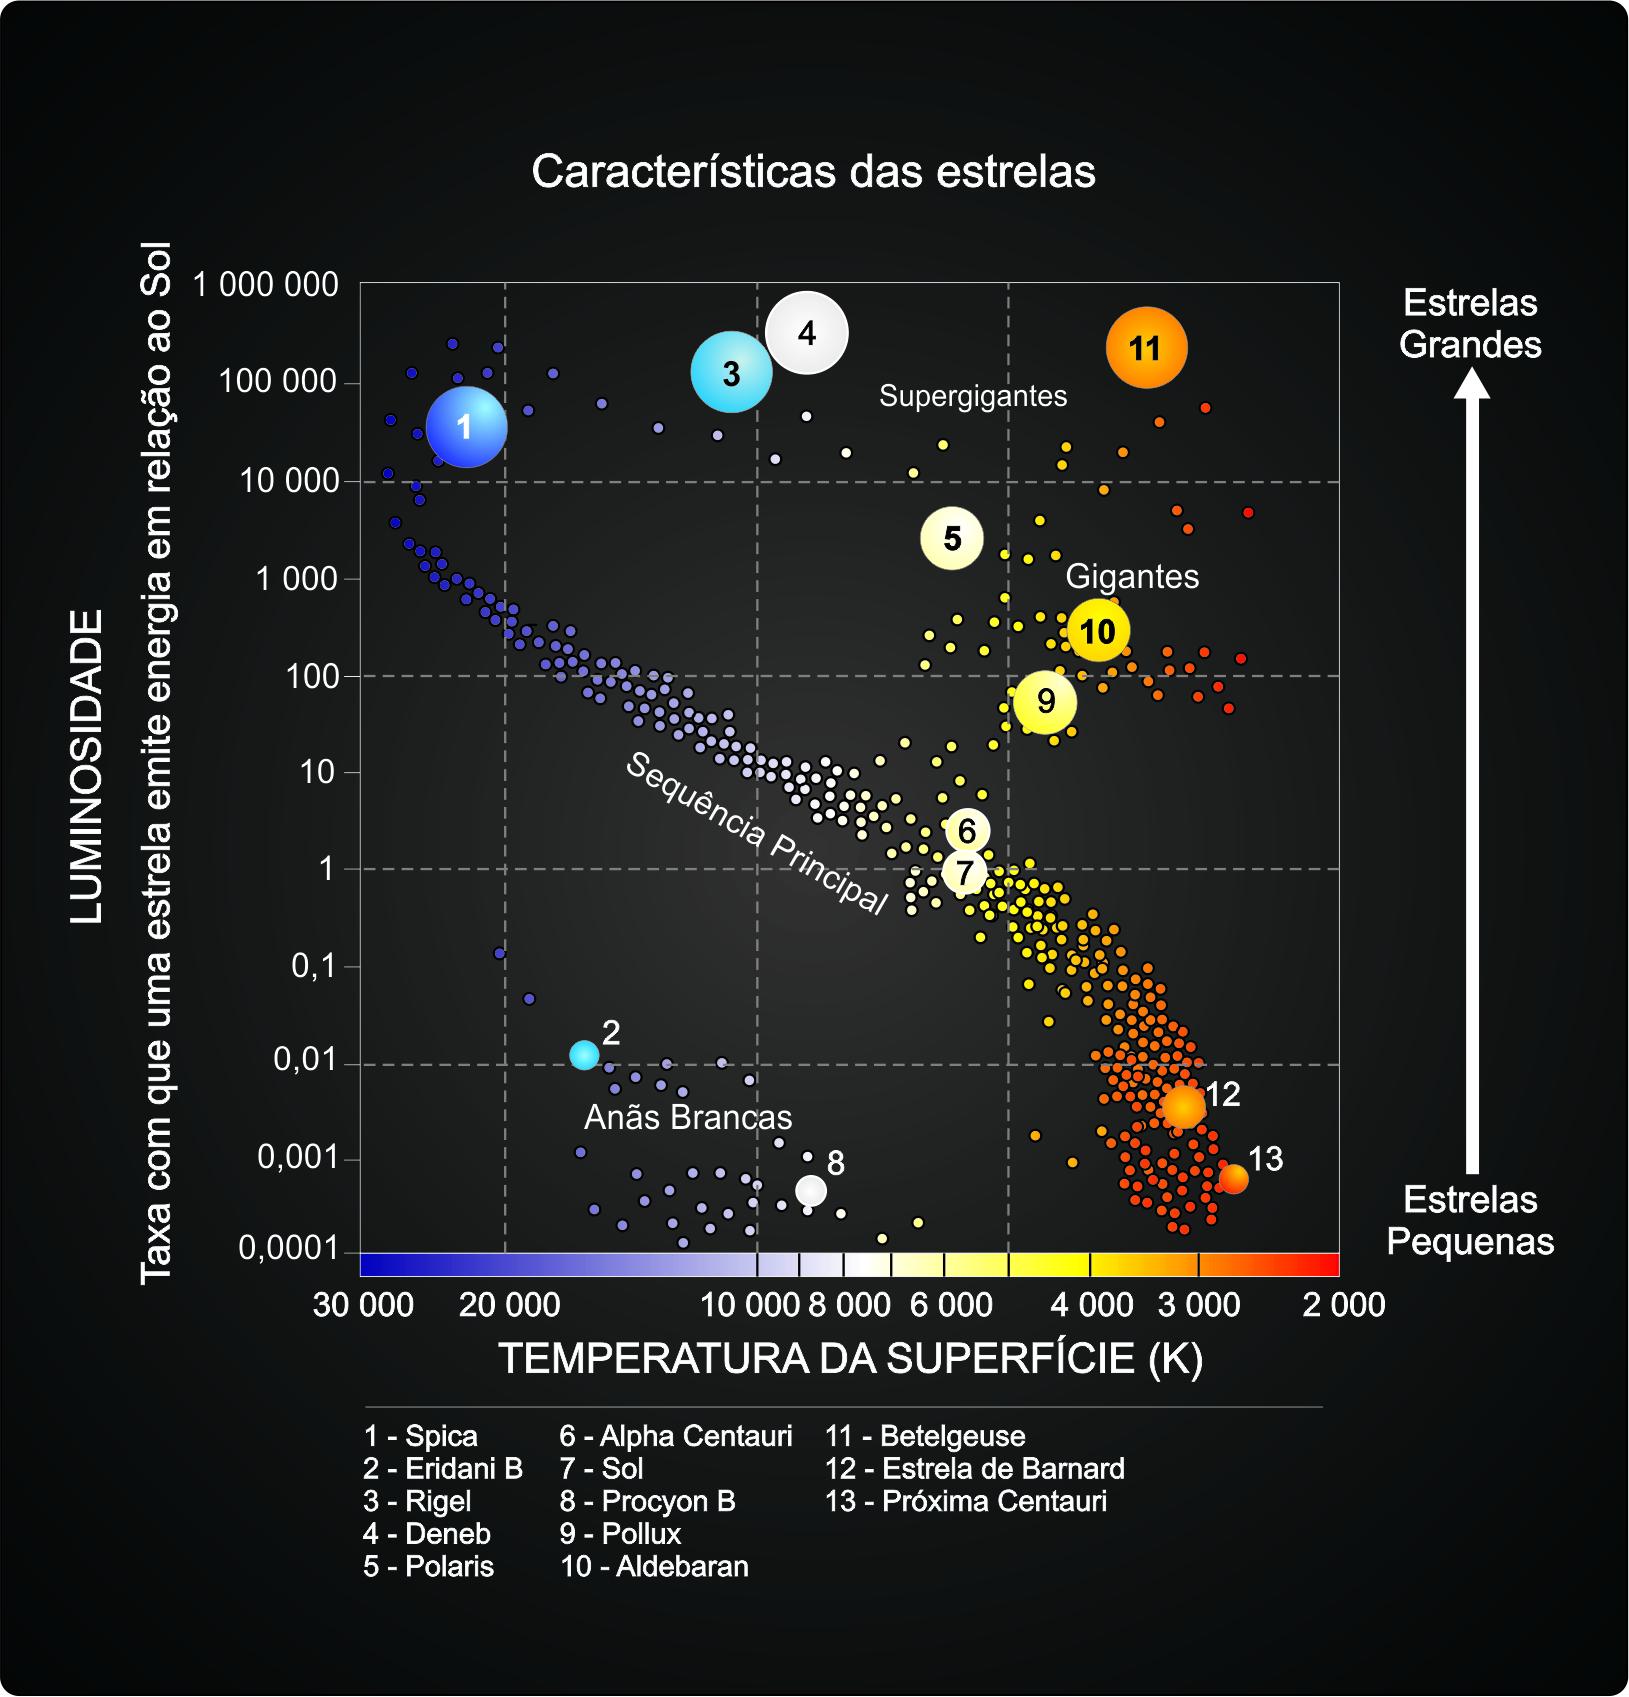 O diagrama hr brazil astronomy diagrama hr foi descoberto independentemente pelo dinamarqus ejnar hertzsprung 1873 1967 em 1911 e pelo americano henry norris russell 1877 1957 ccuart Image collections